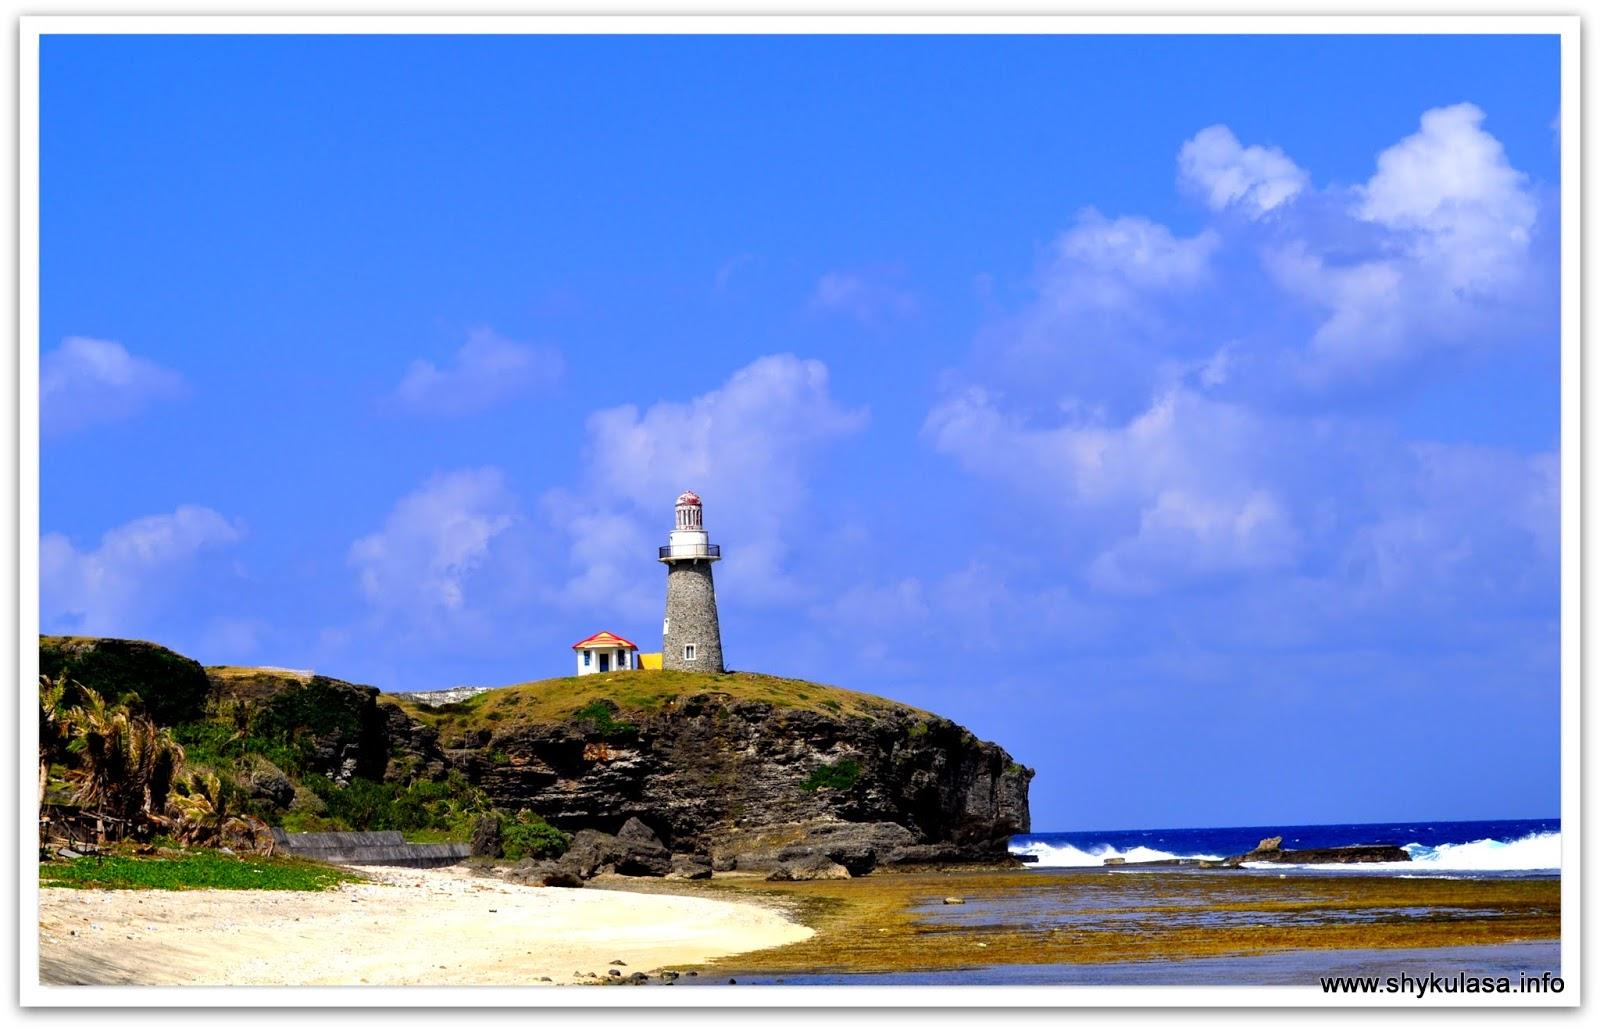 Sabtang Lighthouse, Batanes